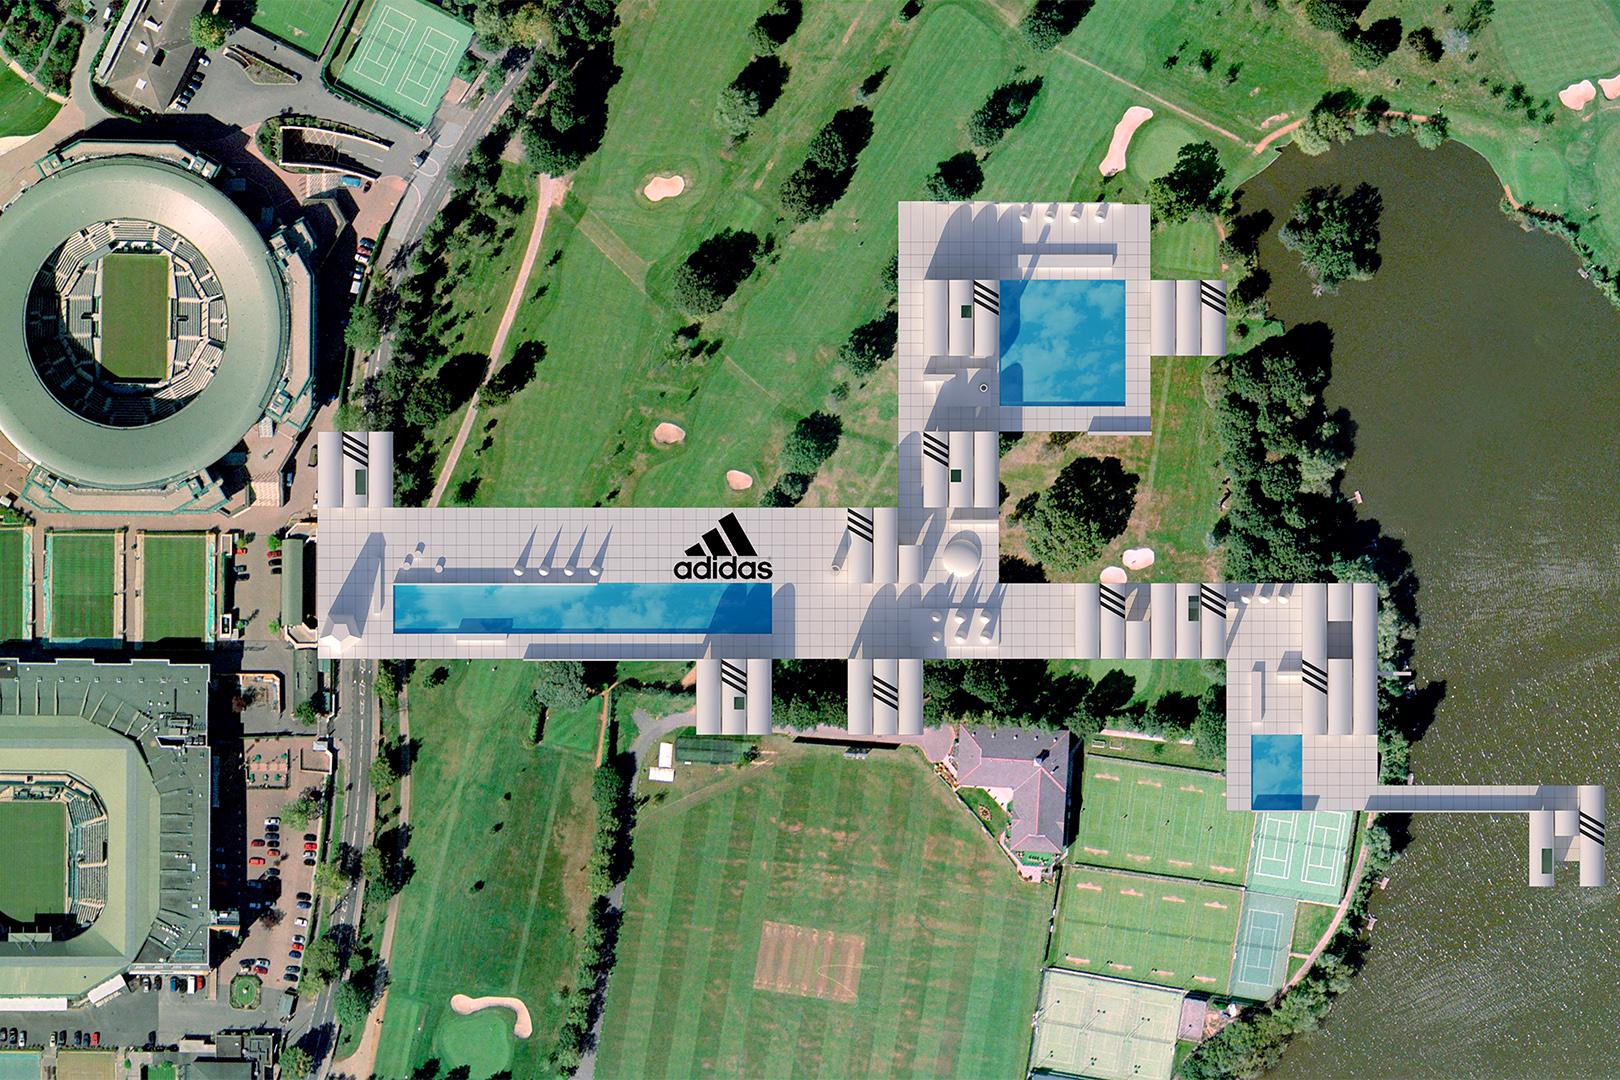 C Adidas Tennis.jpg